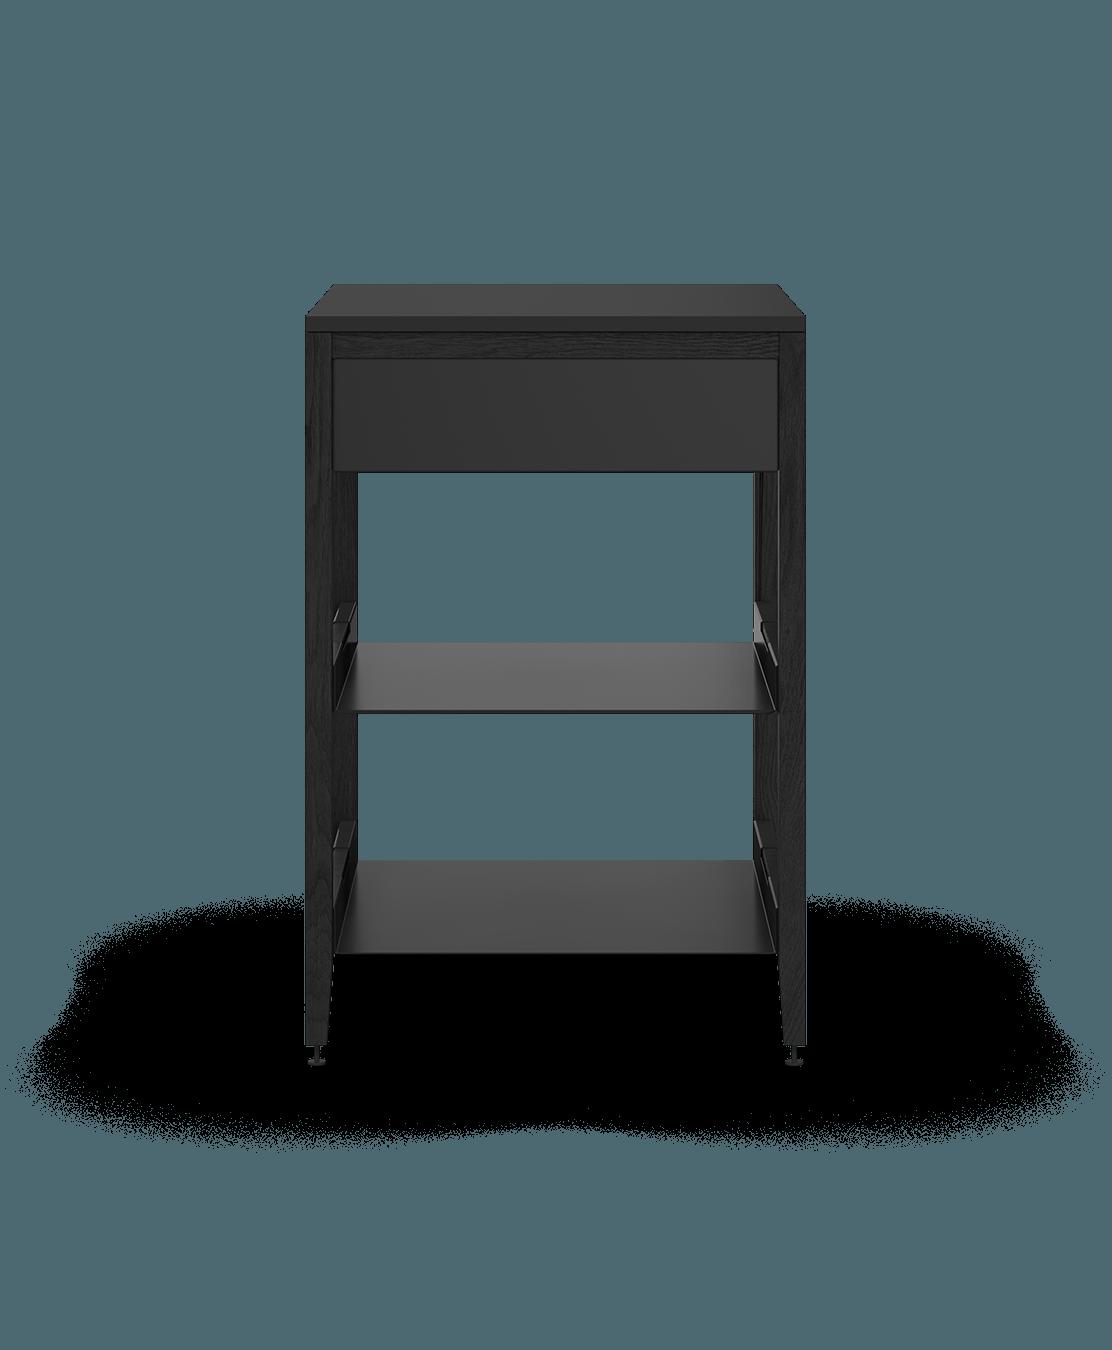 coquo radix midnight black stained oak solid wood modular 2 shelves 1 drawer base kitchen cabinet 24 inch C1-C-24SB-1022-BK